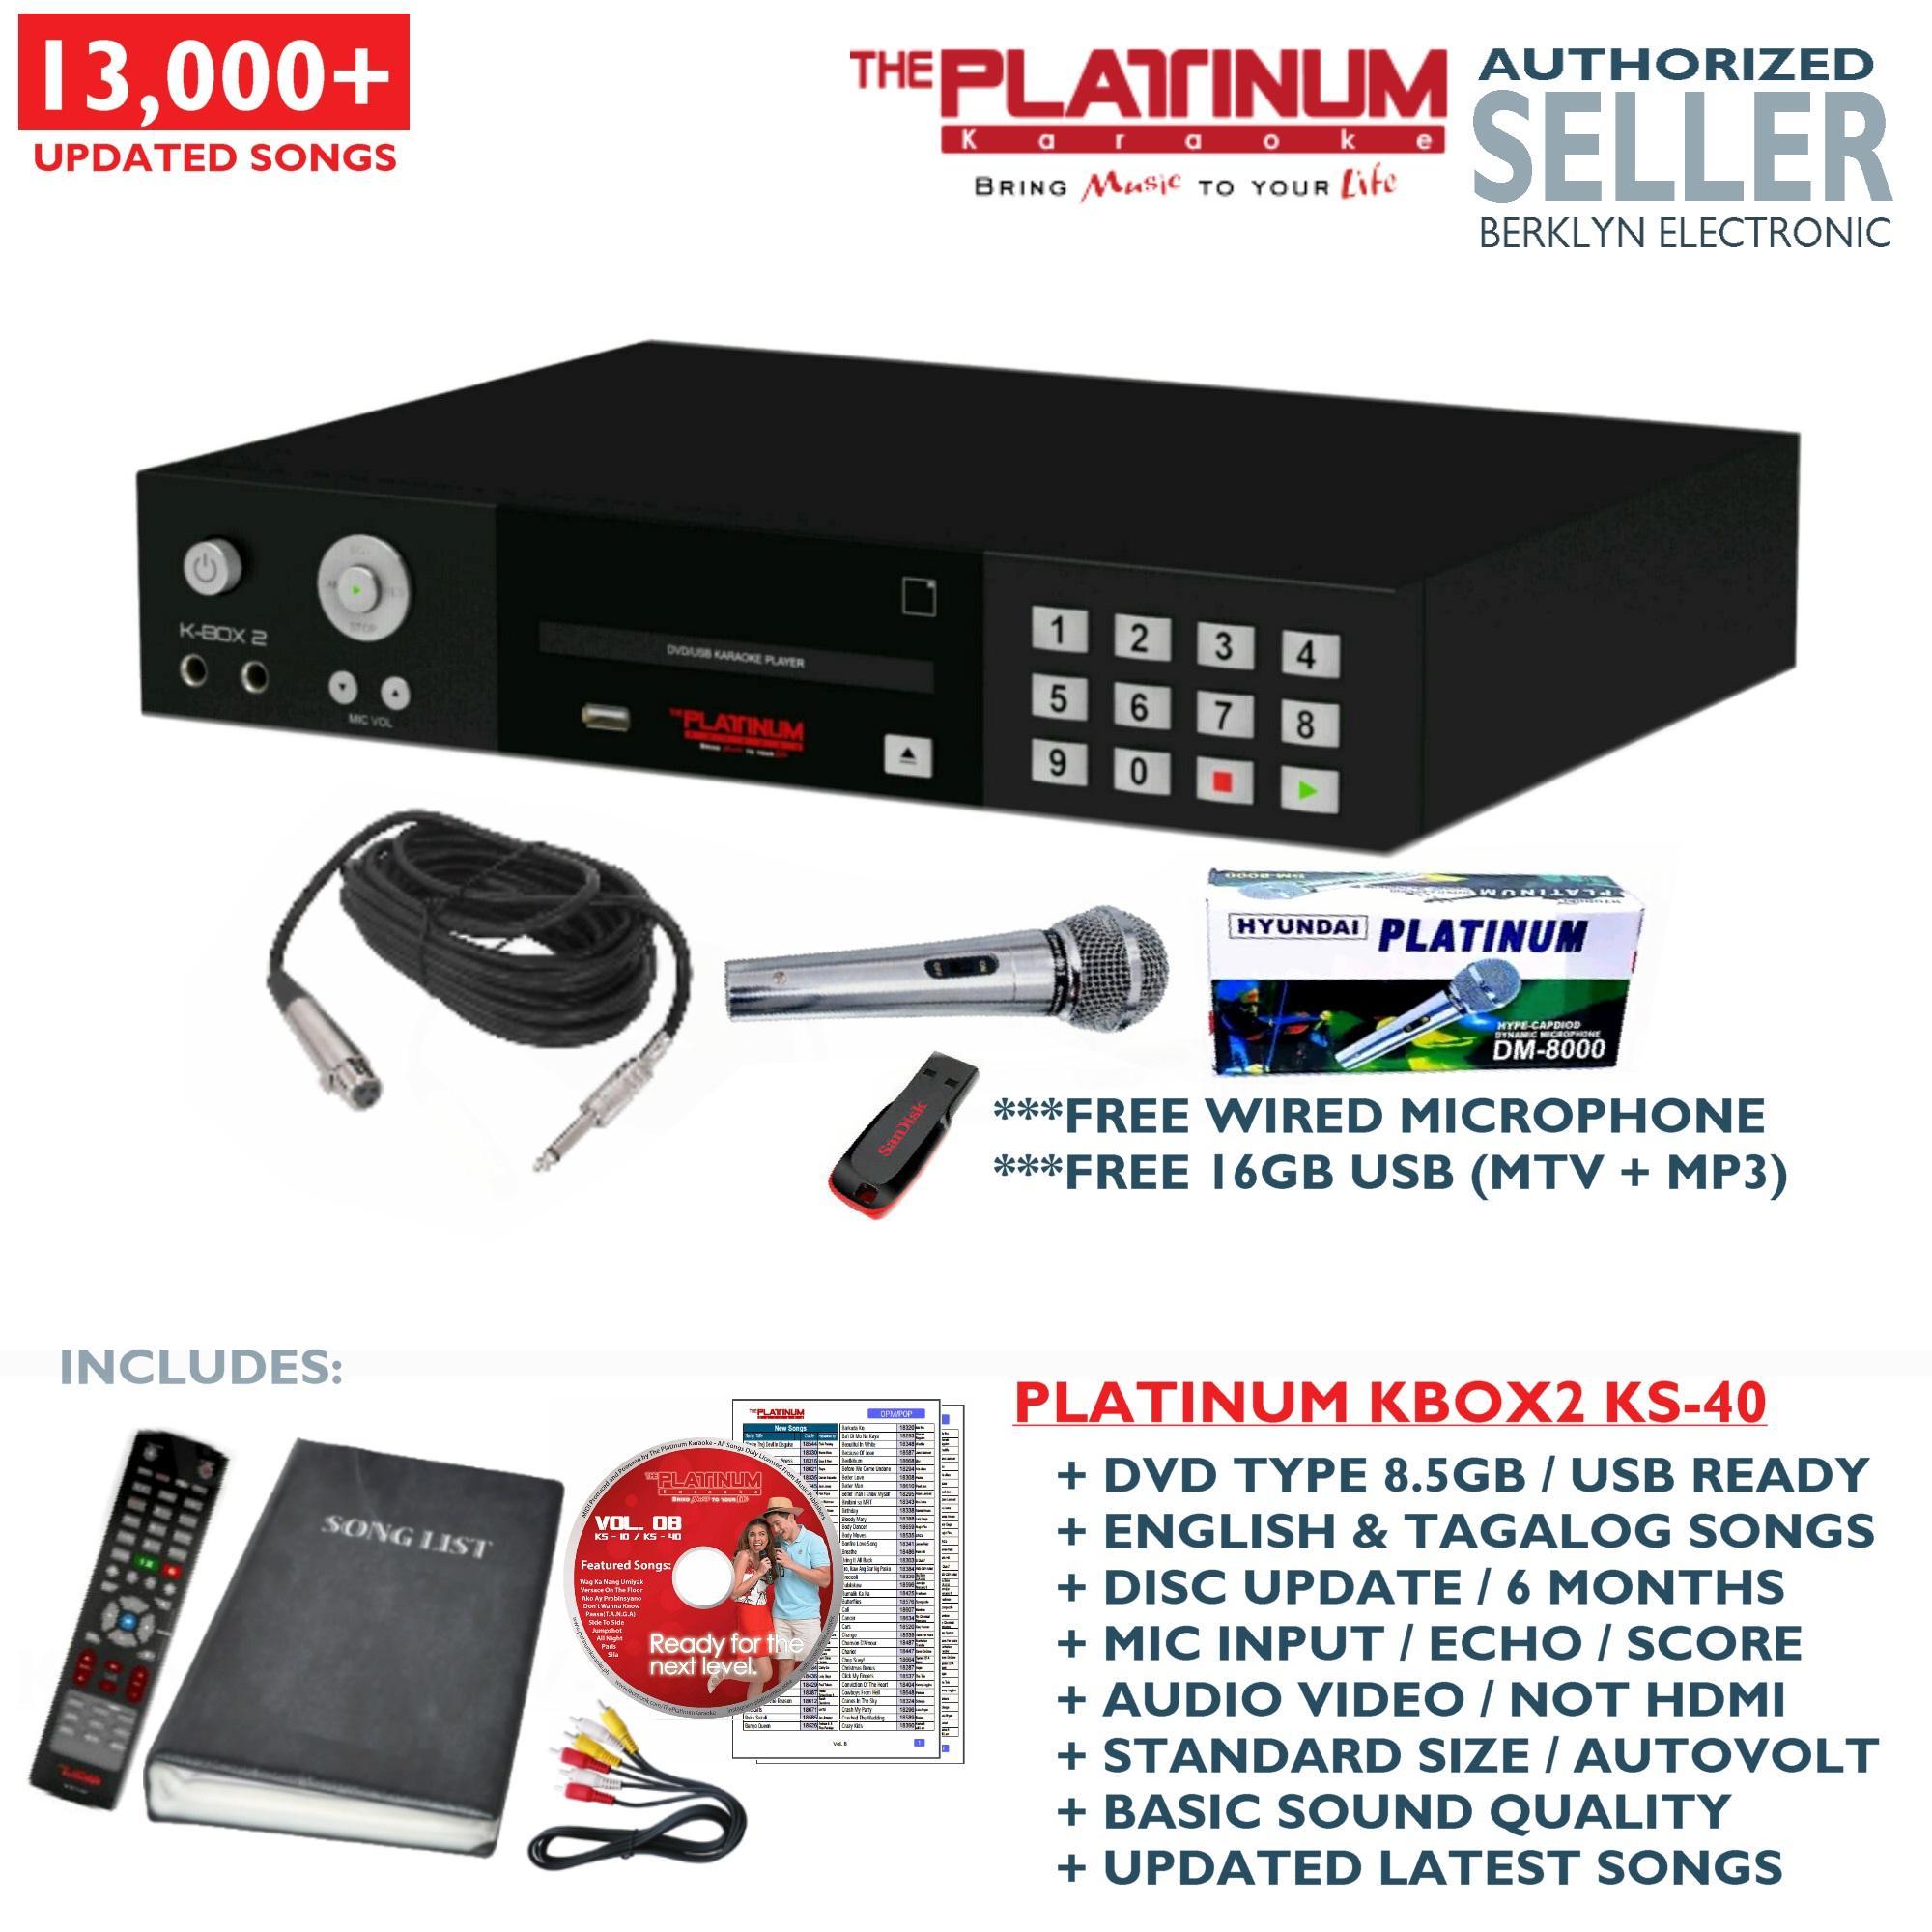 (Free Mic + USB 16GB) Platinum KBOX2 Karaoke Player + DVD + Songbook +  Remote (14000+ Songs)